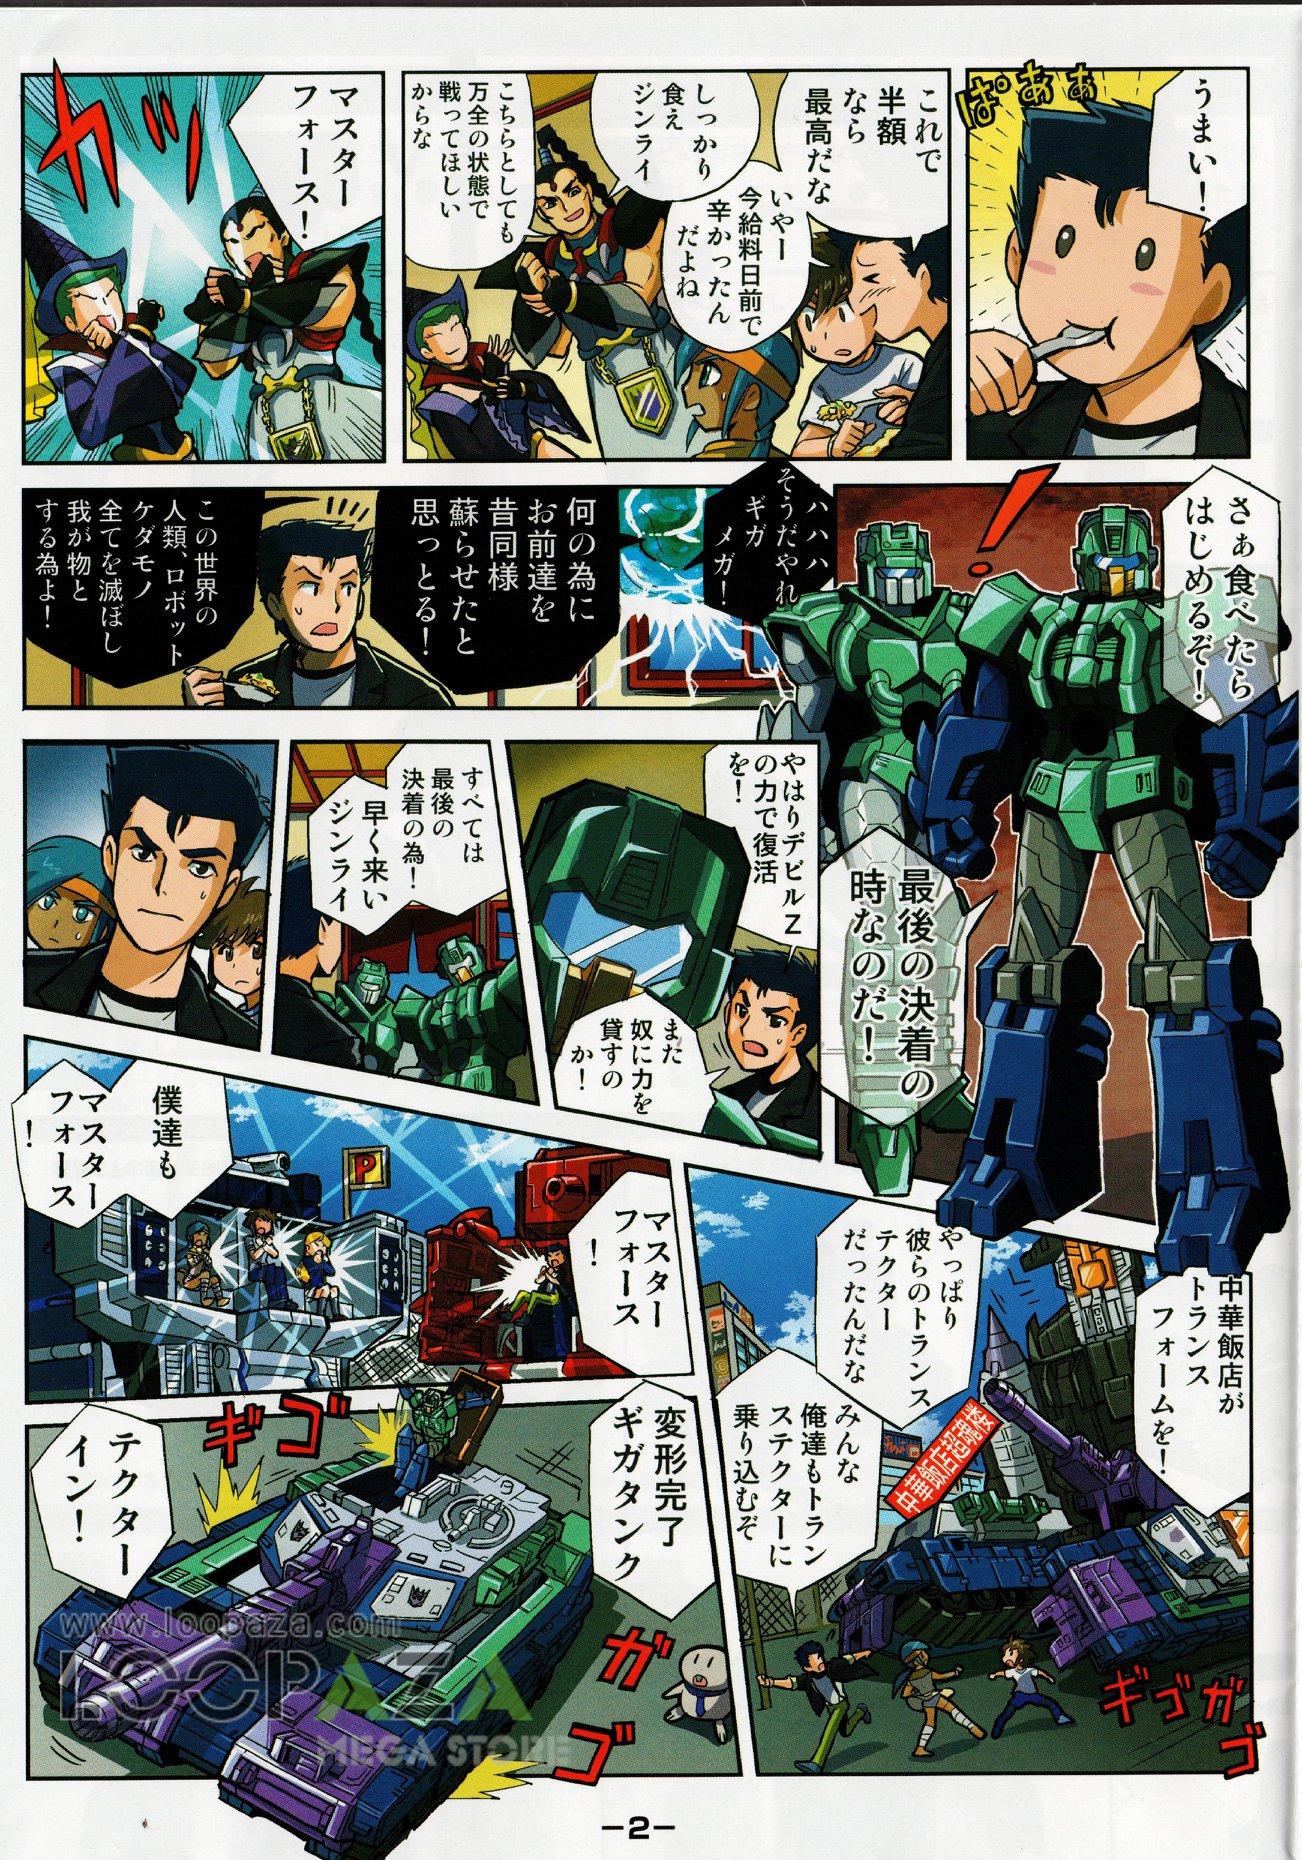 Transformers Animated Wallpaper Takara Lg 60 Manga And Bio Card Scans New Overlord